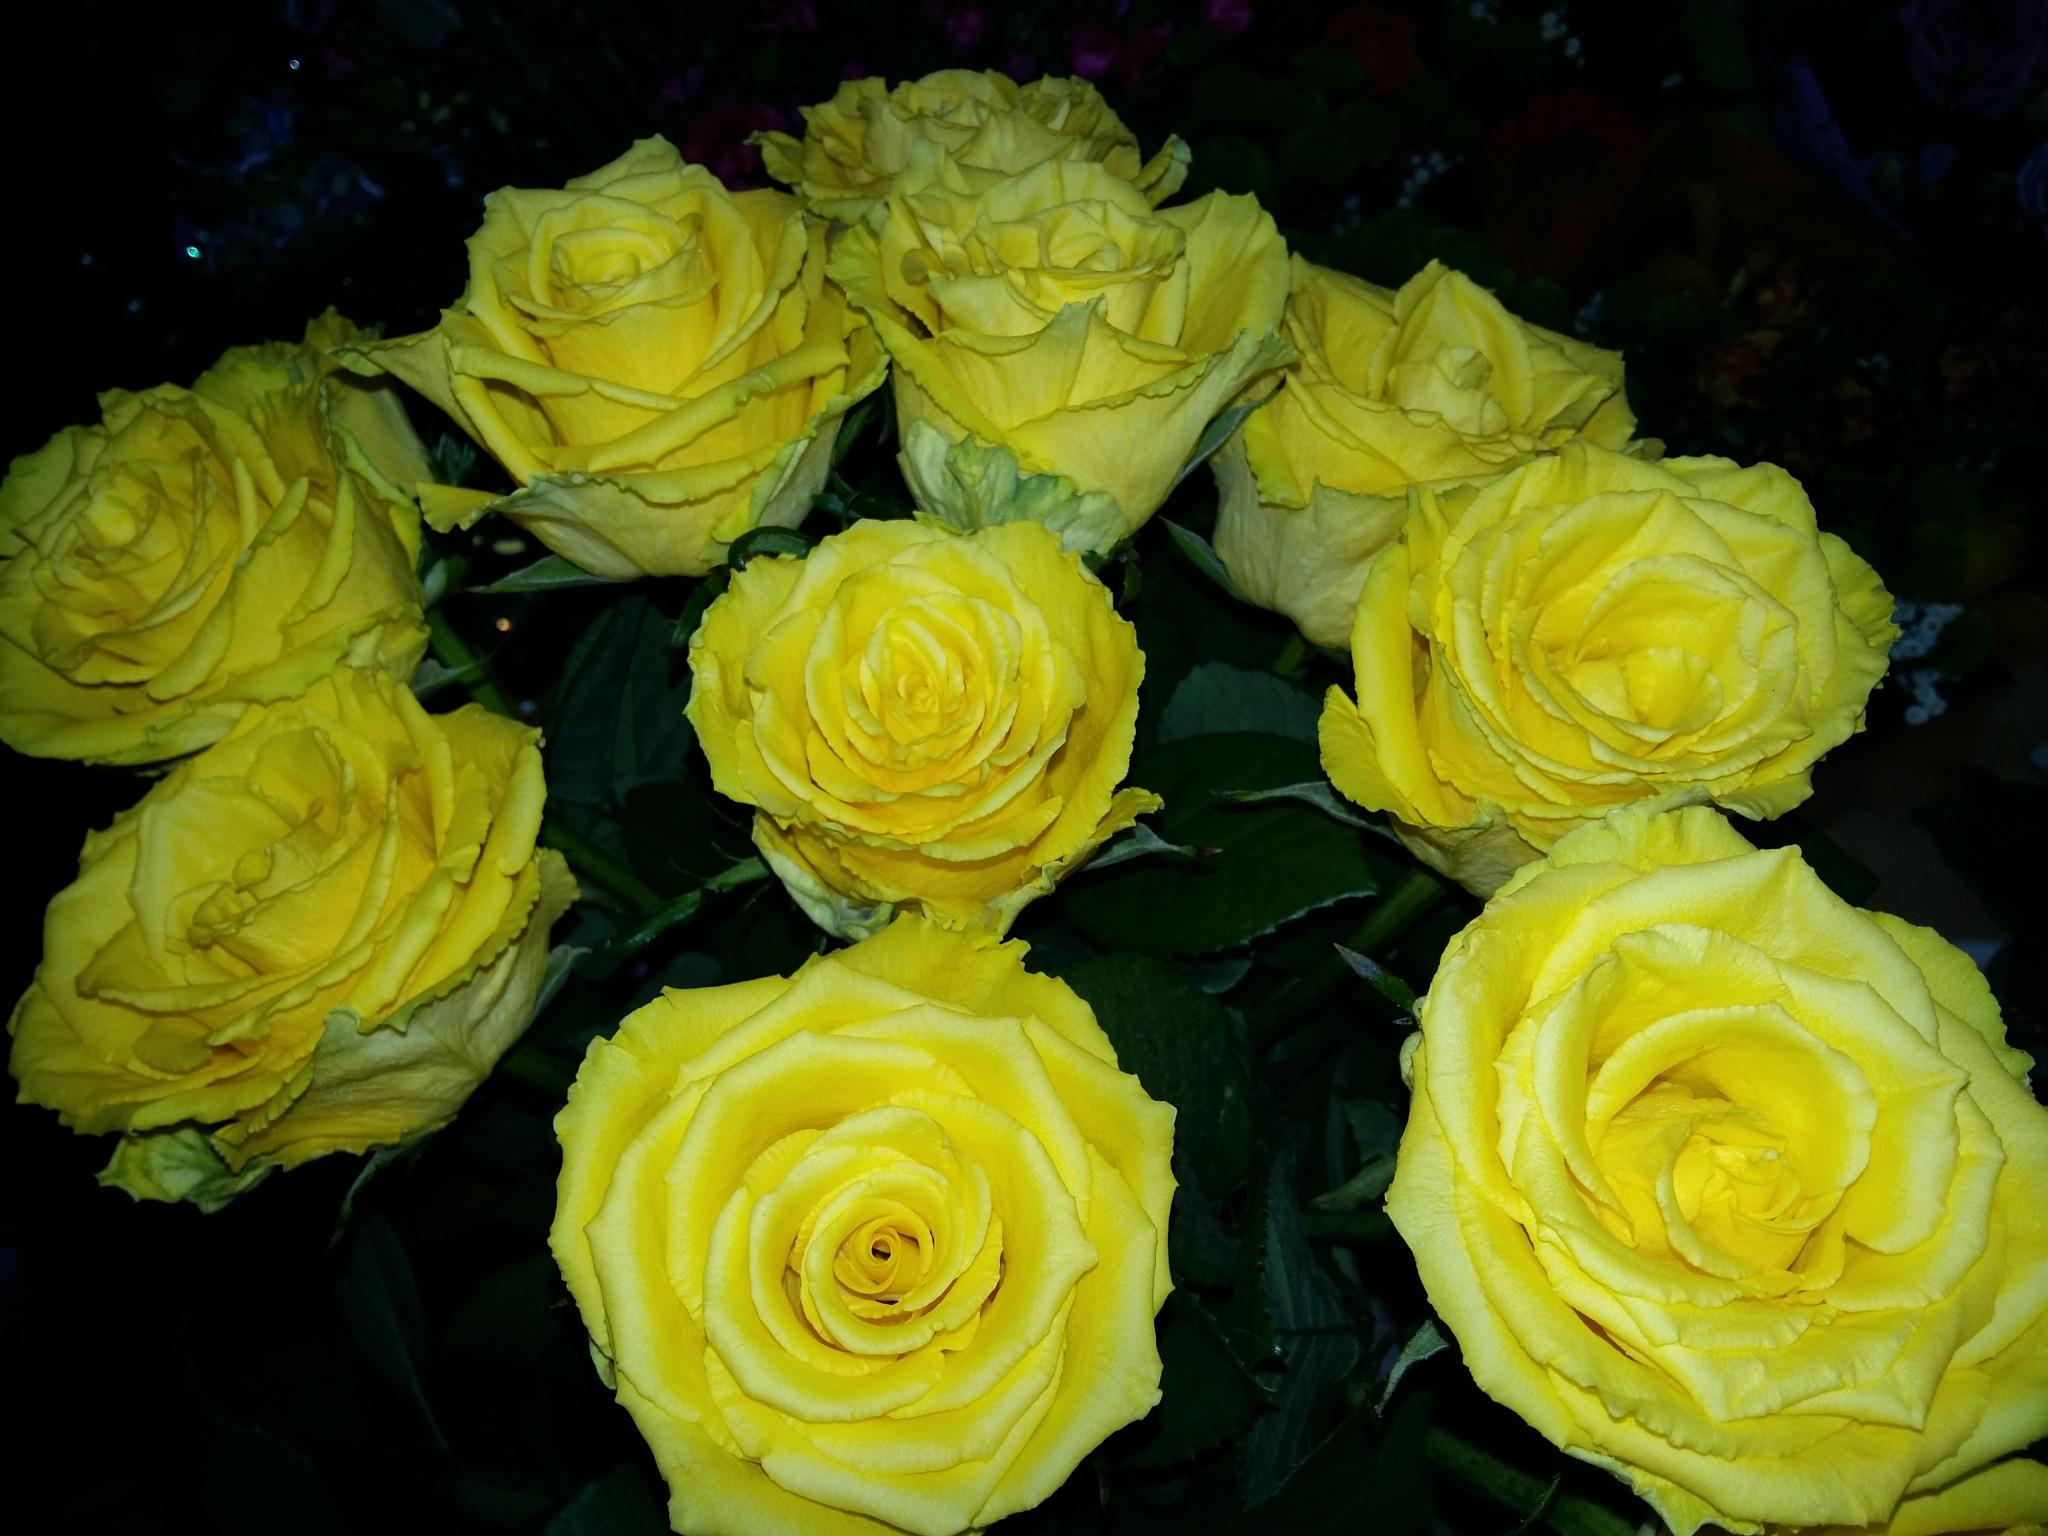 Yellow roses by uzkuraitiene62